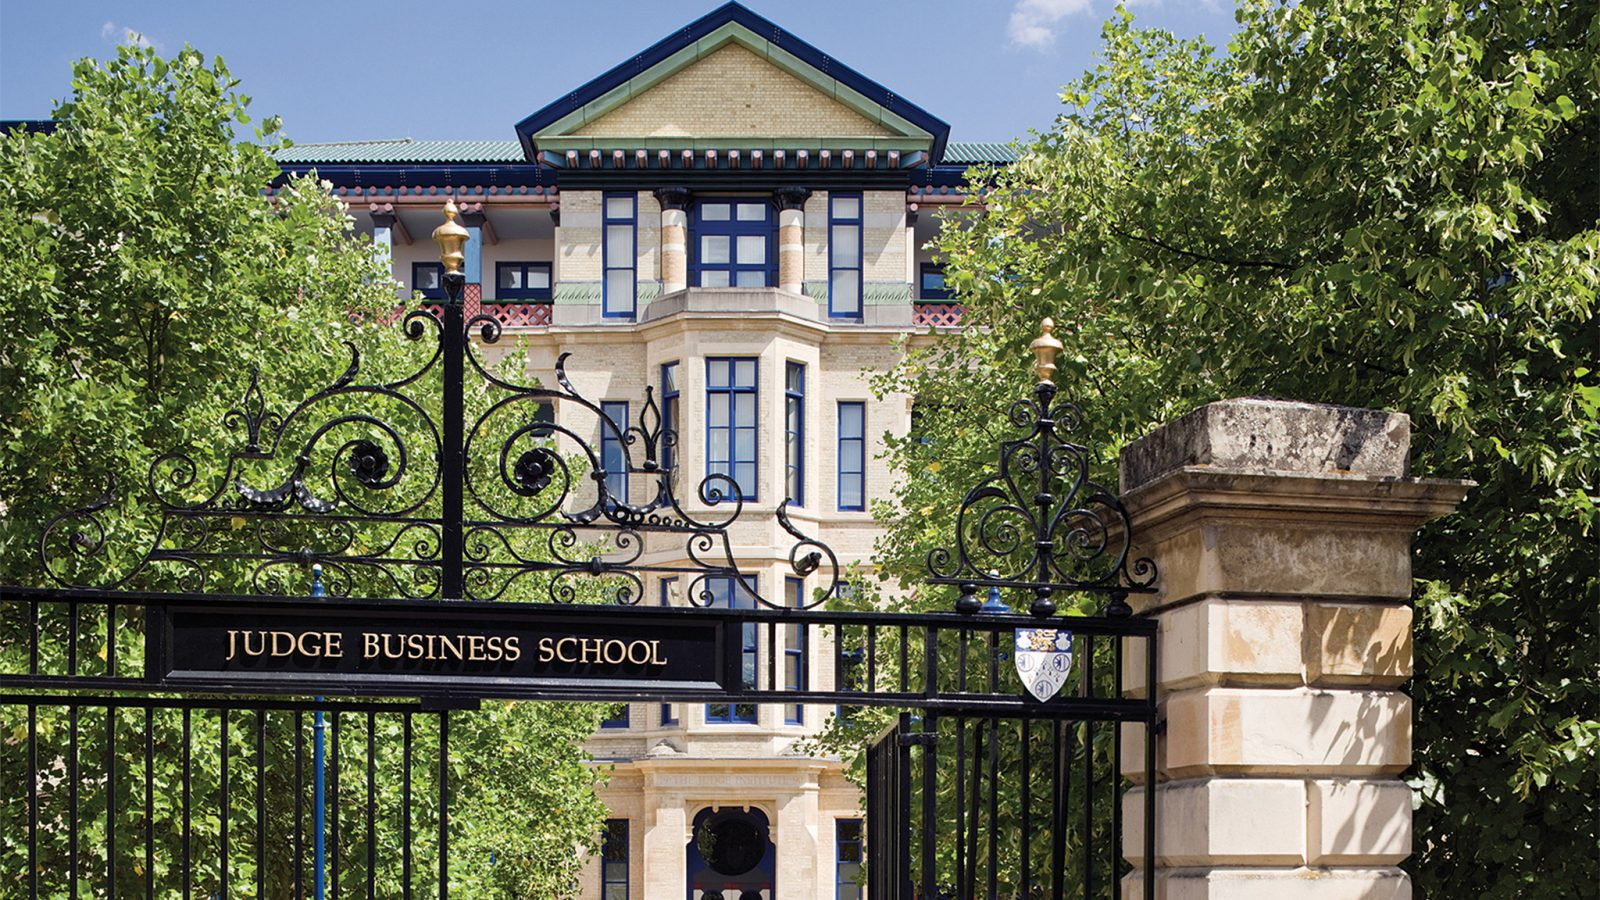 CAMBRIDGE-JUDGE BUSINESS SCHOOL